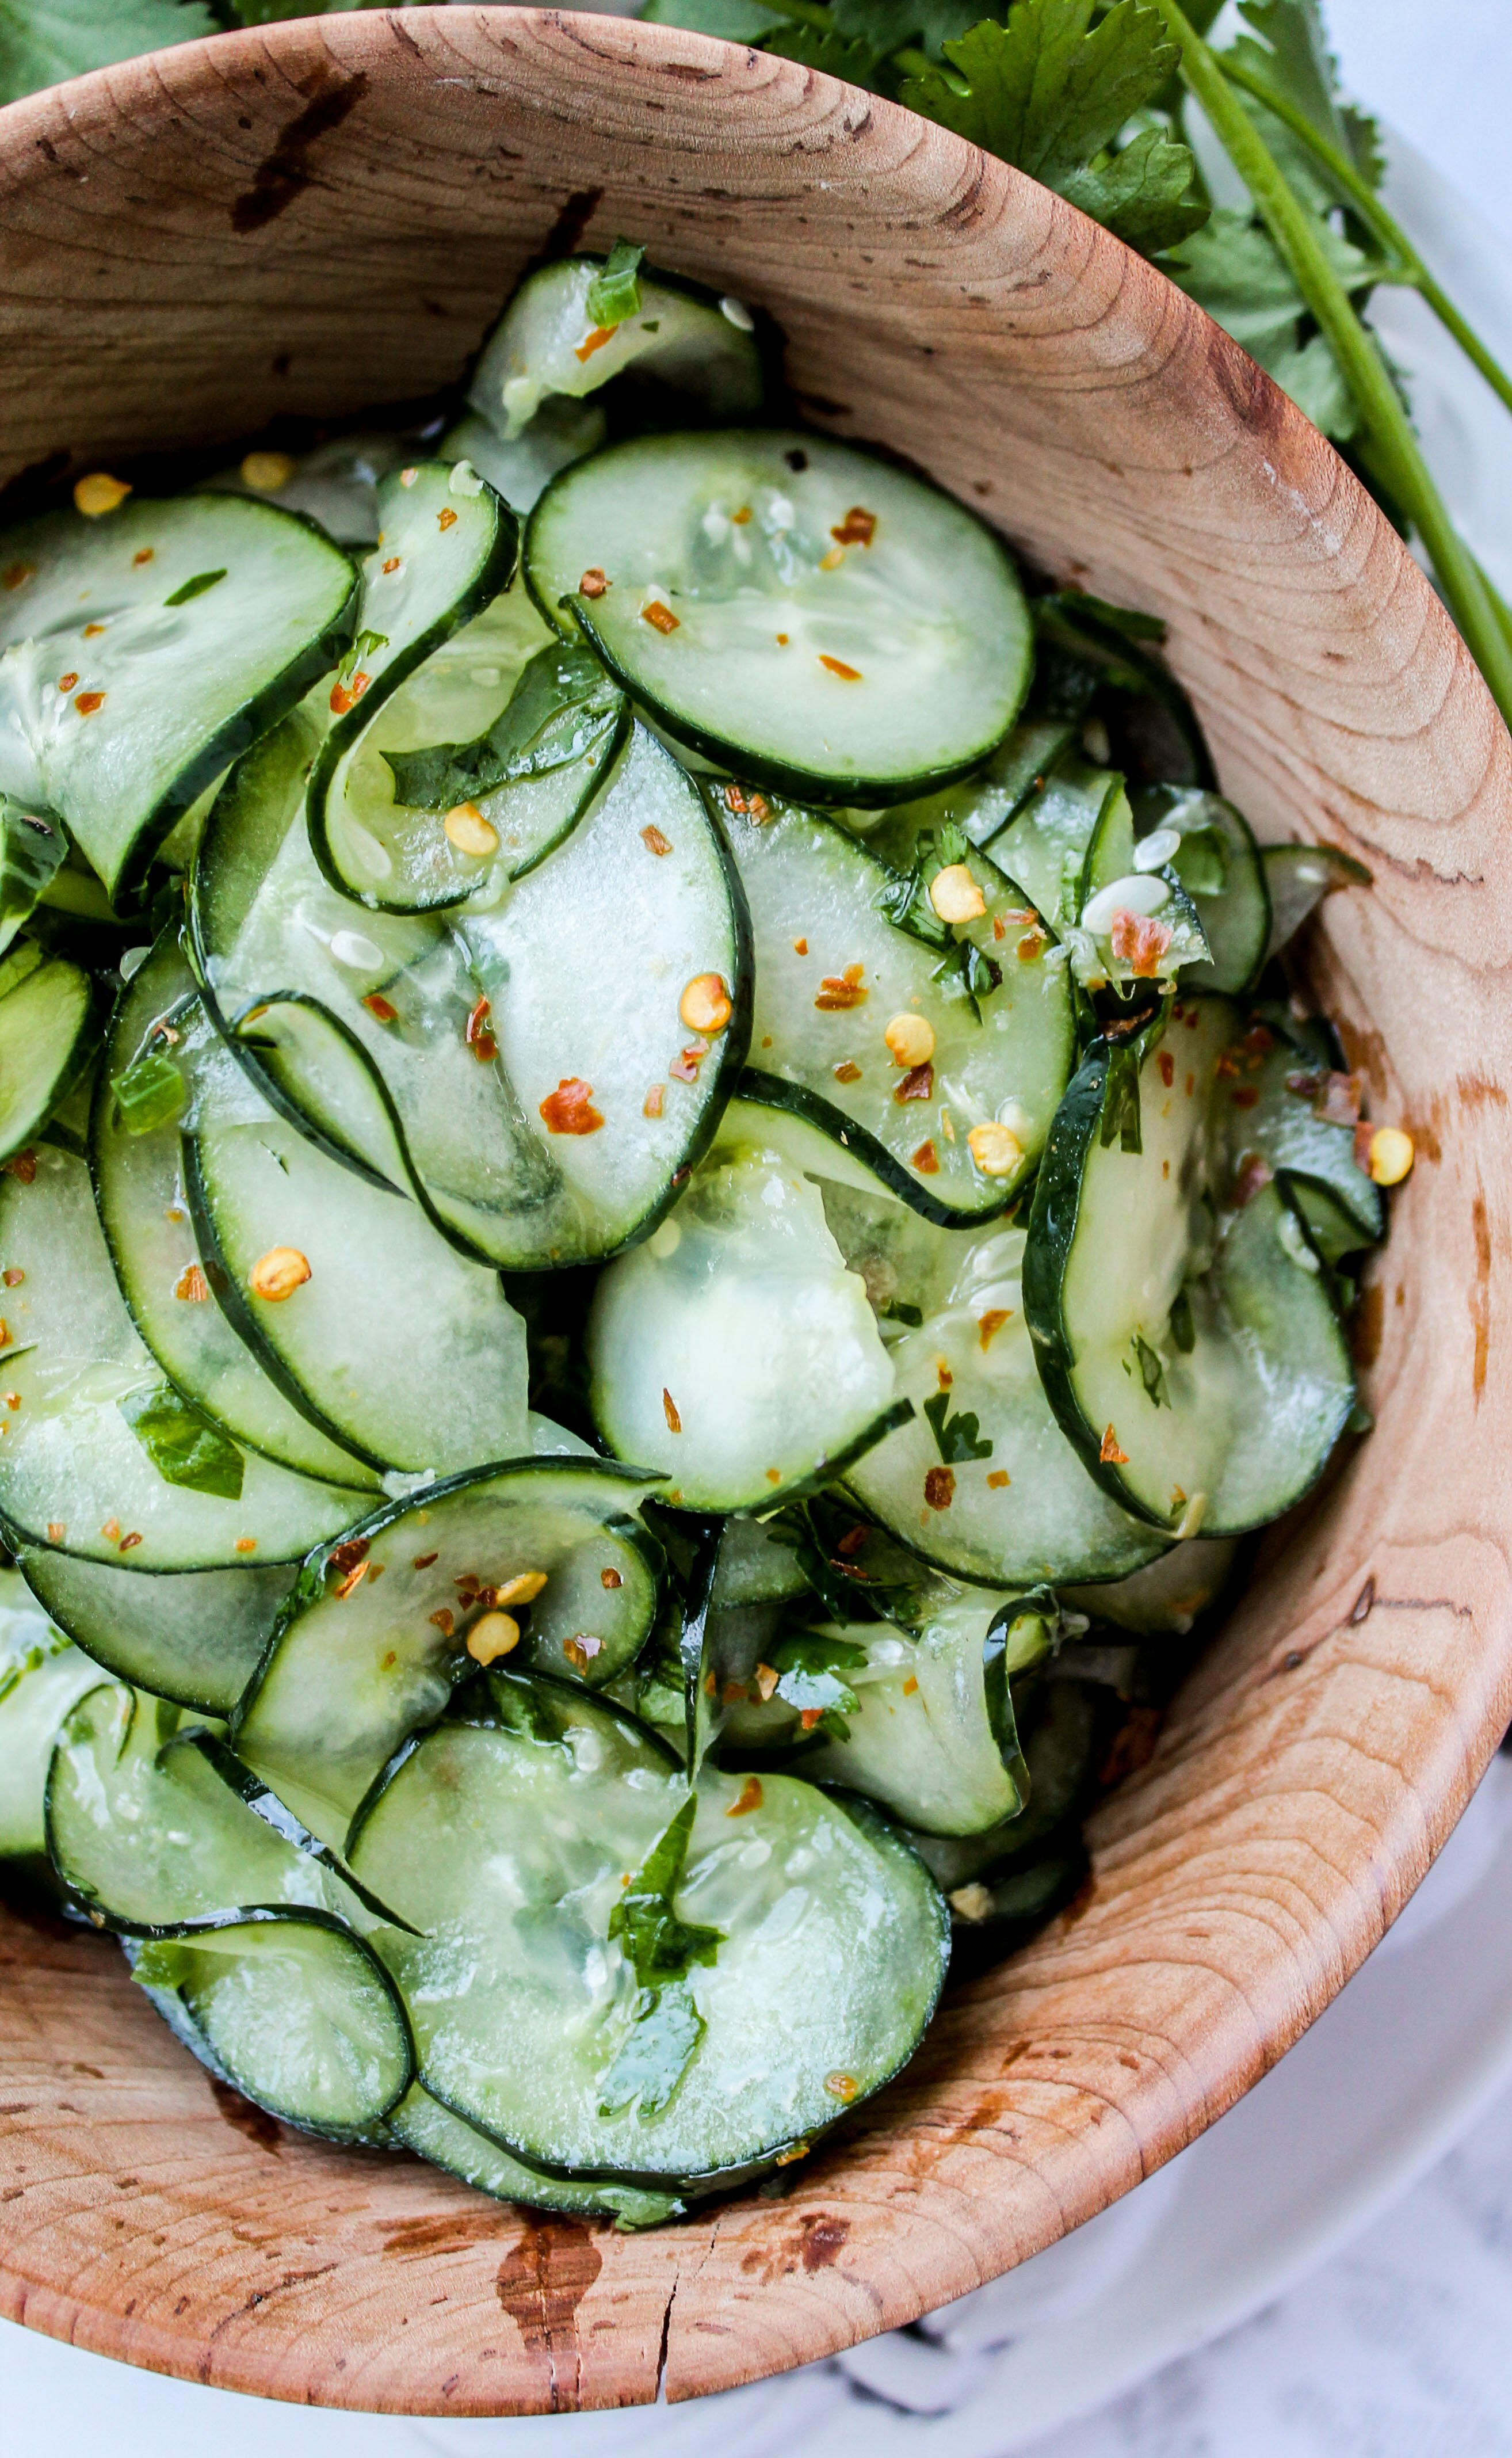 Cilantro-Lime Cucumber Salad - The Food Charlatan